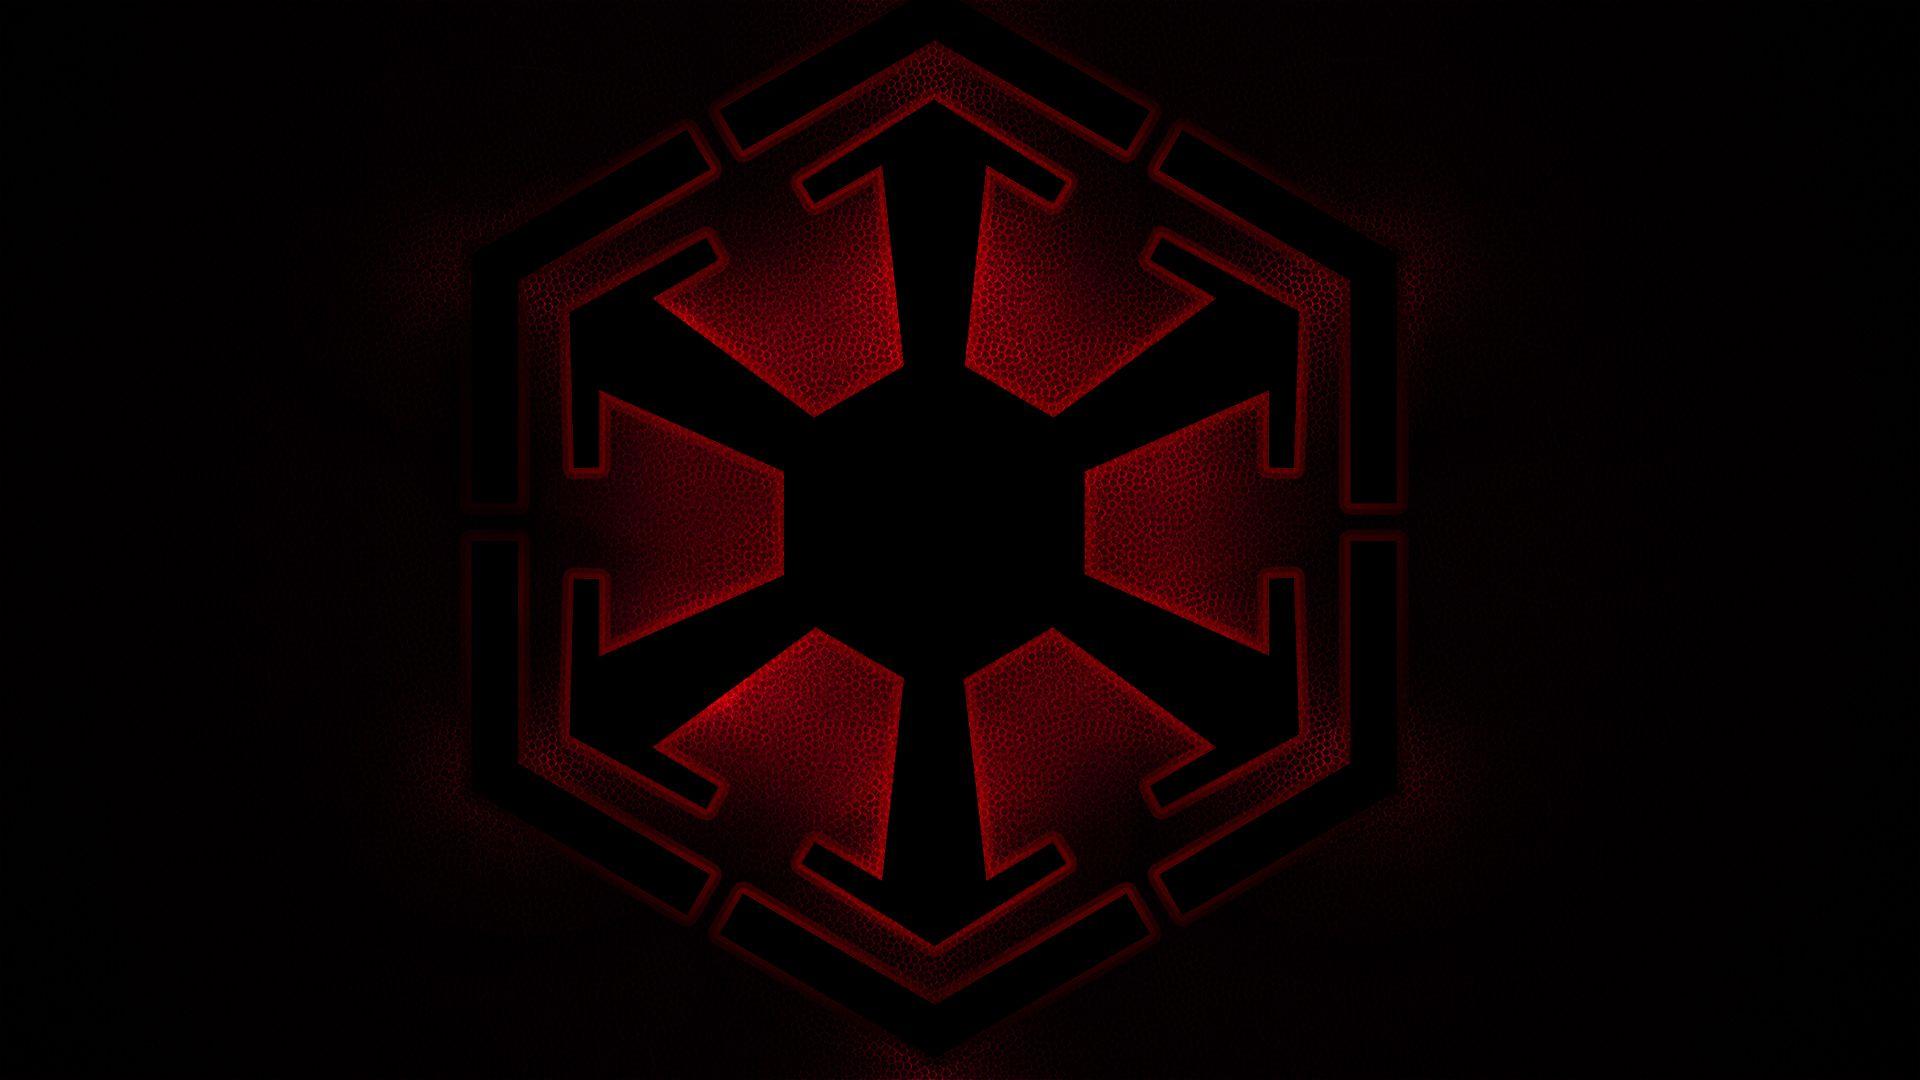 Star Wars Sith Wallpaper Full Hd On Wallpaper 1080p Hd Star Wars Wallpaper Star Wars Background Star Wars Sith